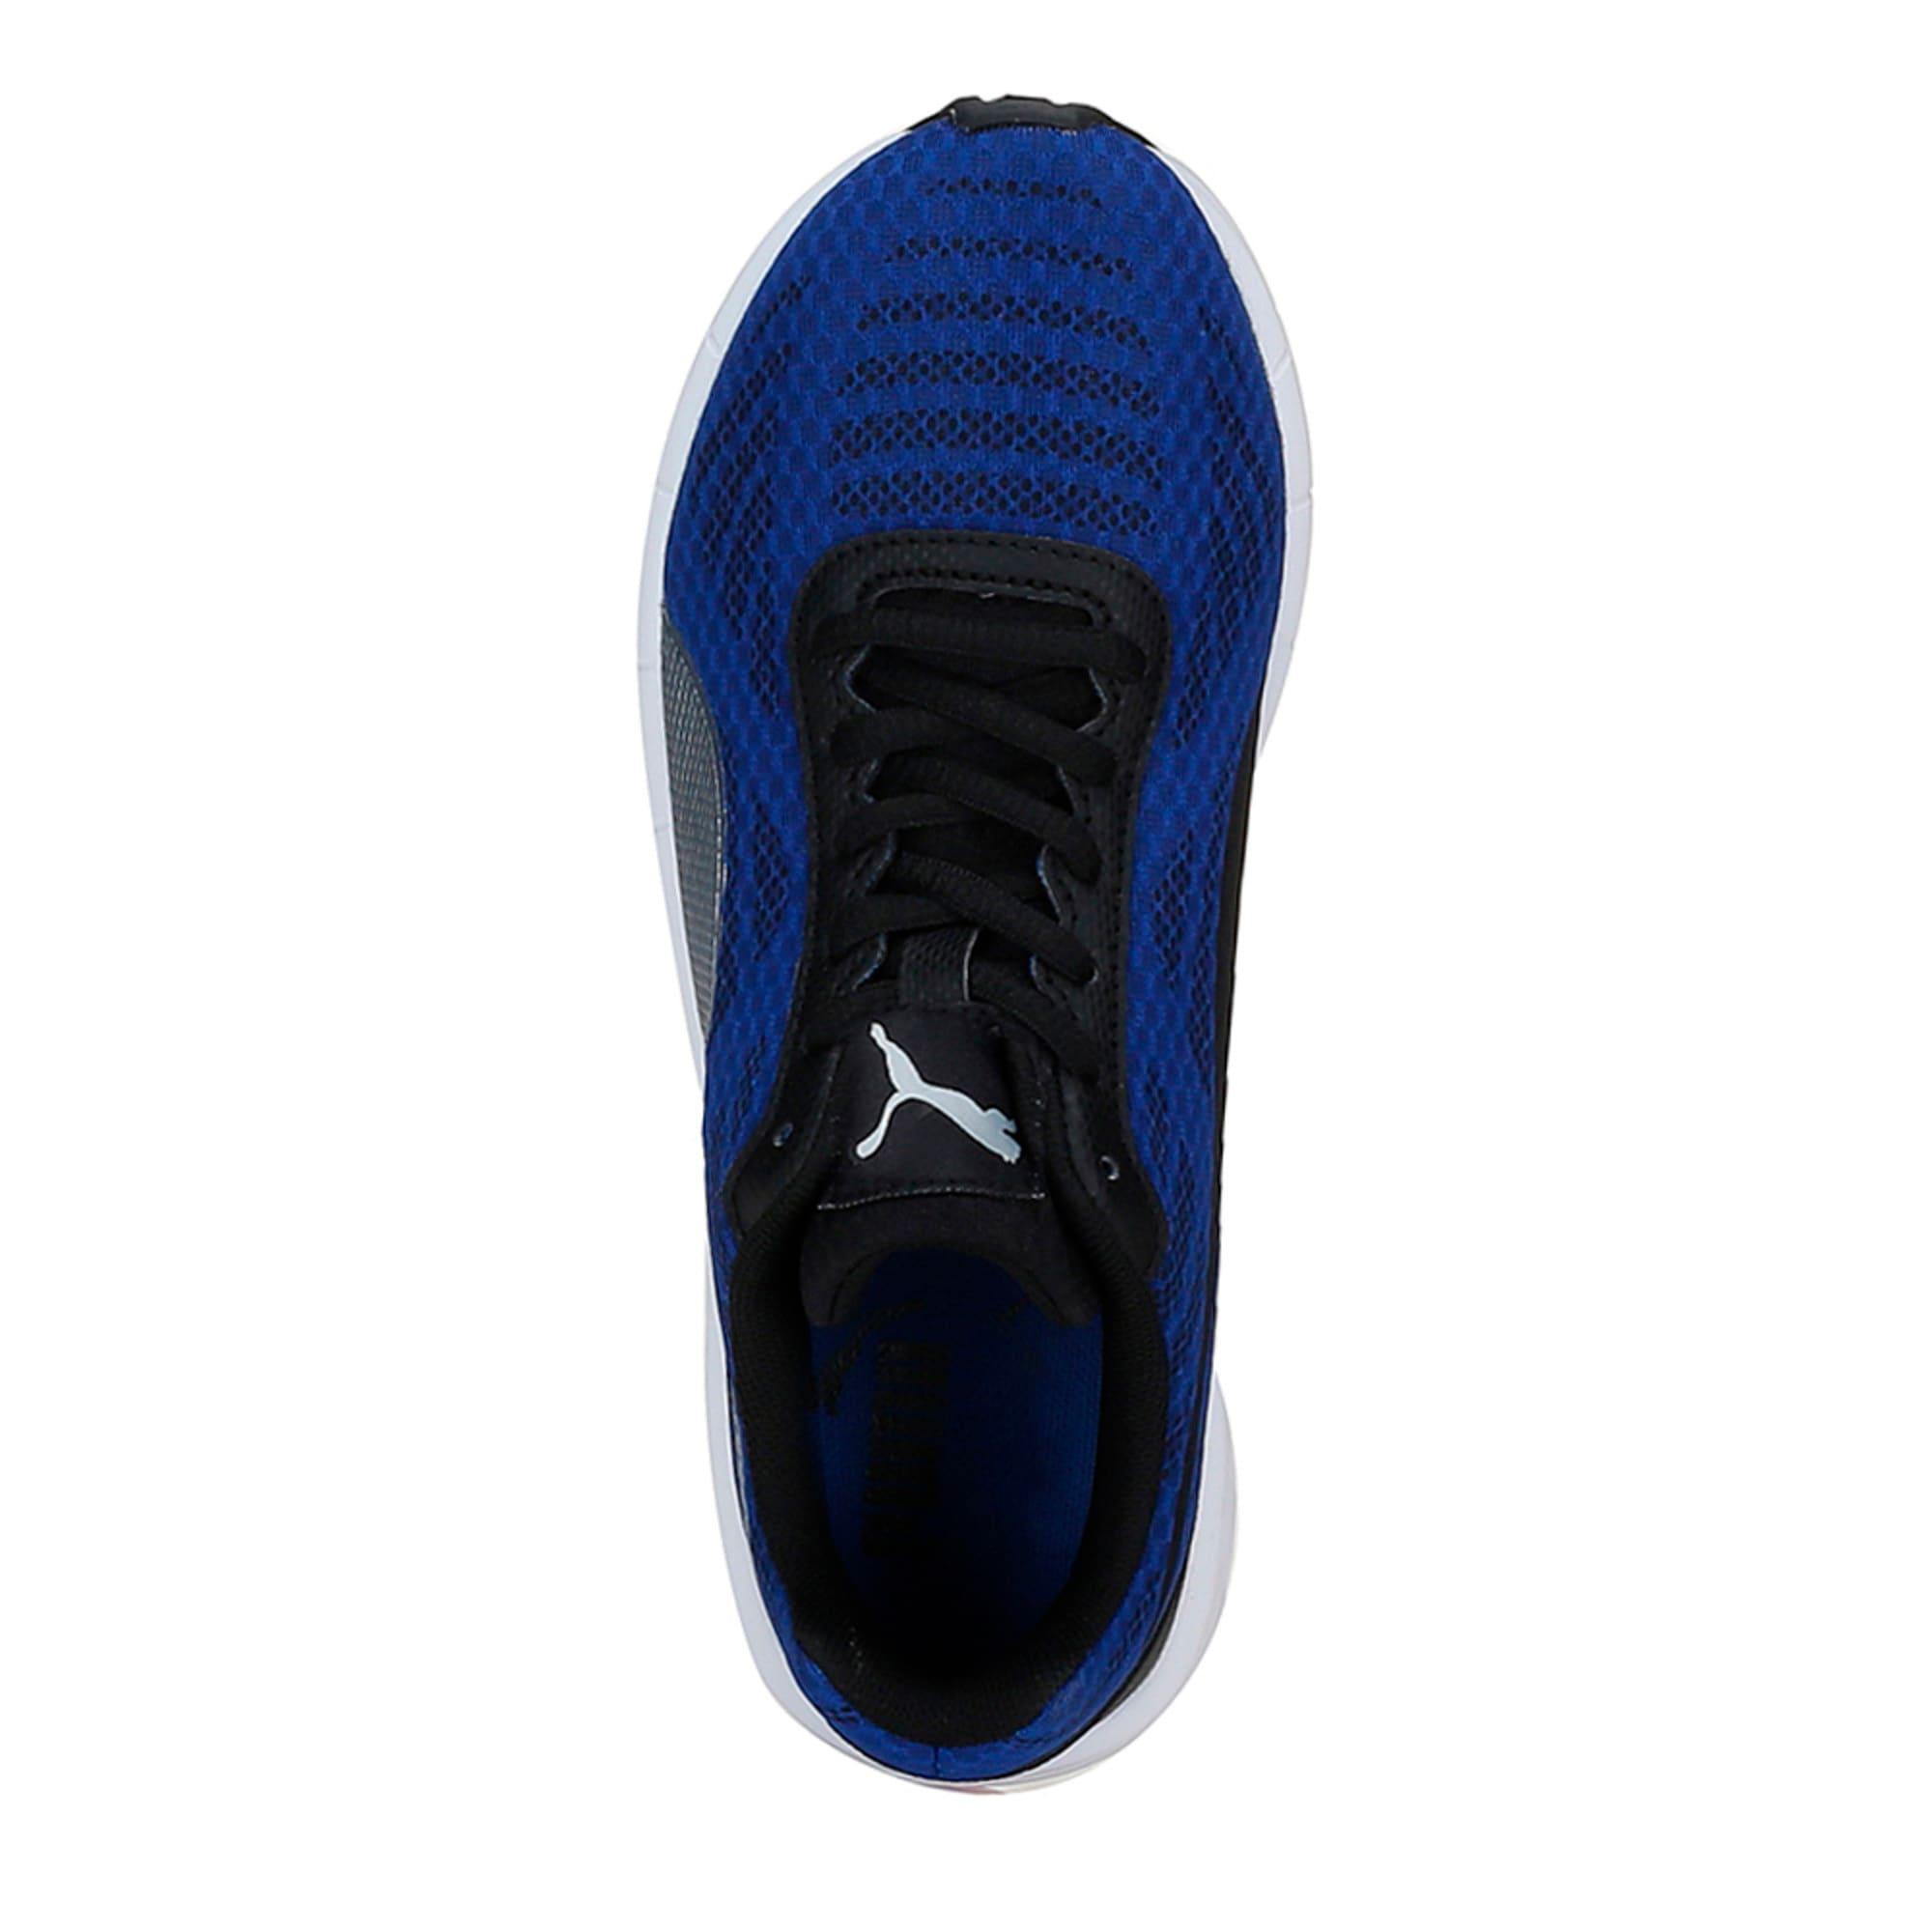 Thumbnail 3 of Meteor Jr, TRUE BLUE-Puma Black, medium-IND